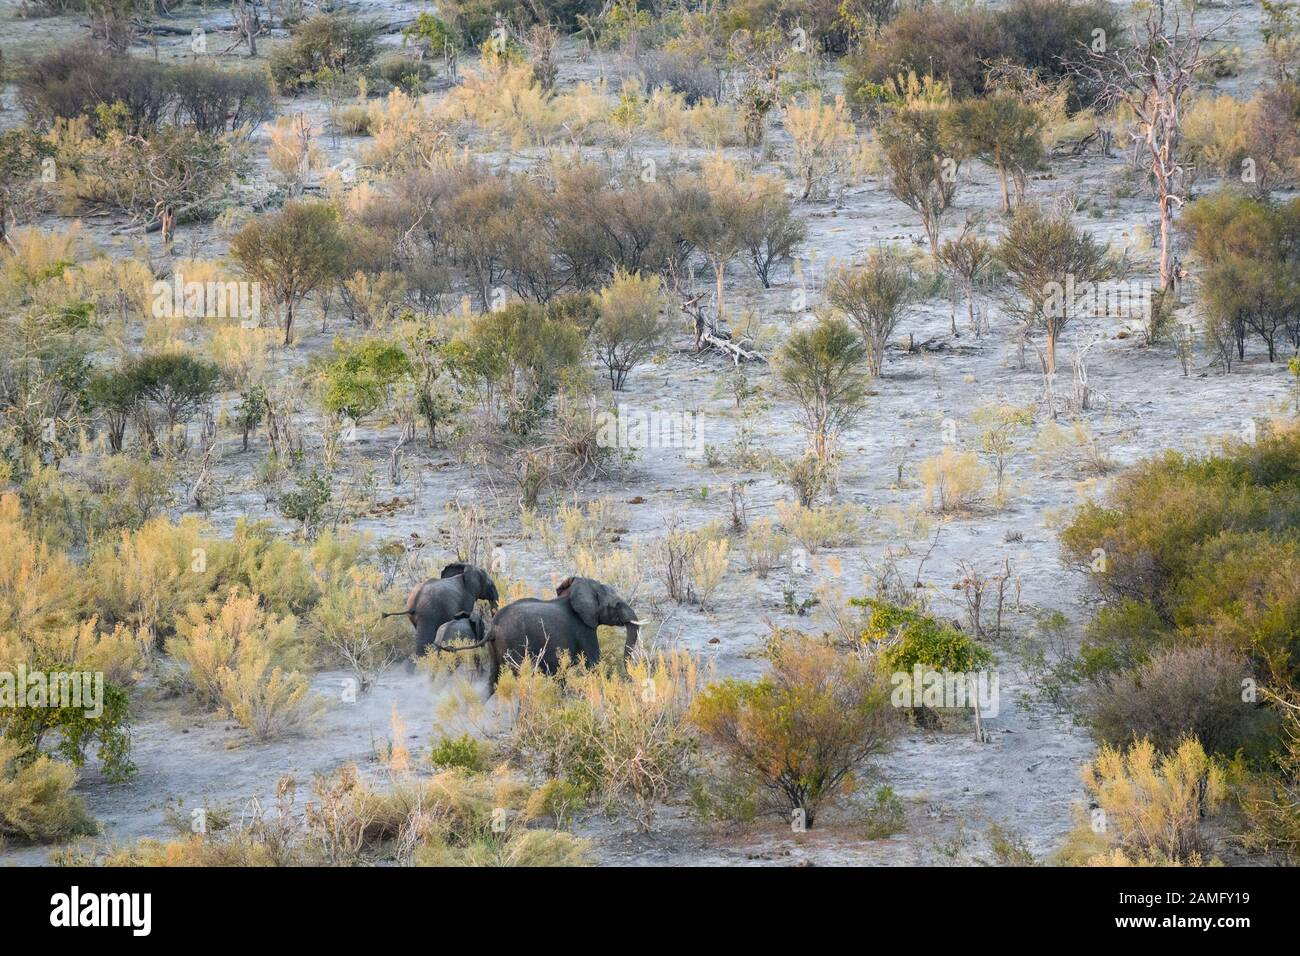 Aerial view of African Elephant, Loxodonta africana, seen from a hot air balloon ride, Bushman Plains, Okavanago Delta, Botswana Stock Photo